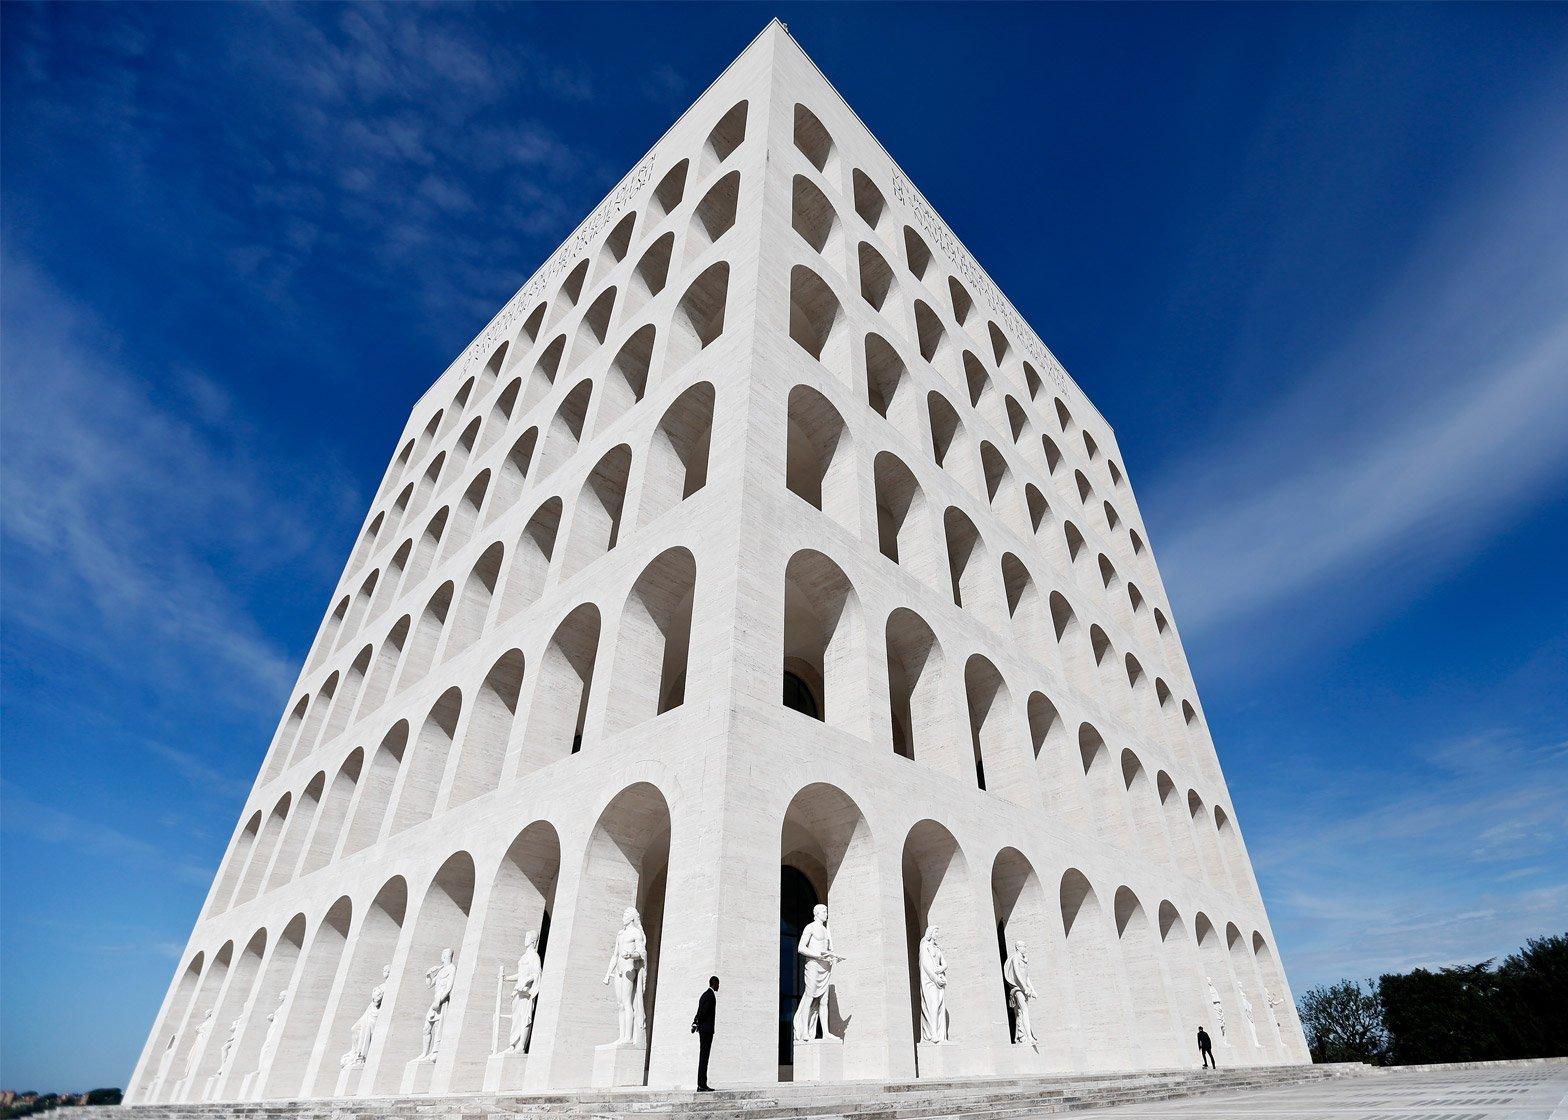 Fendi headquarters in Rome, Italy